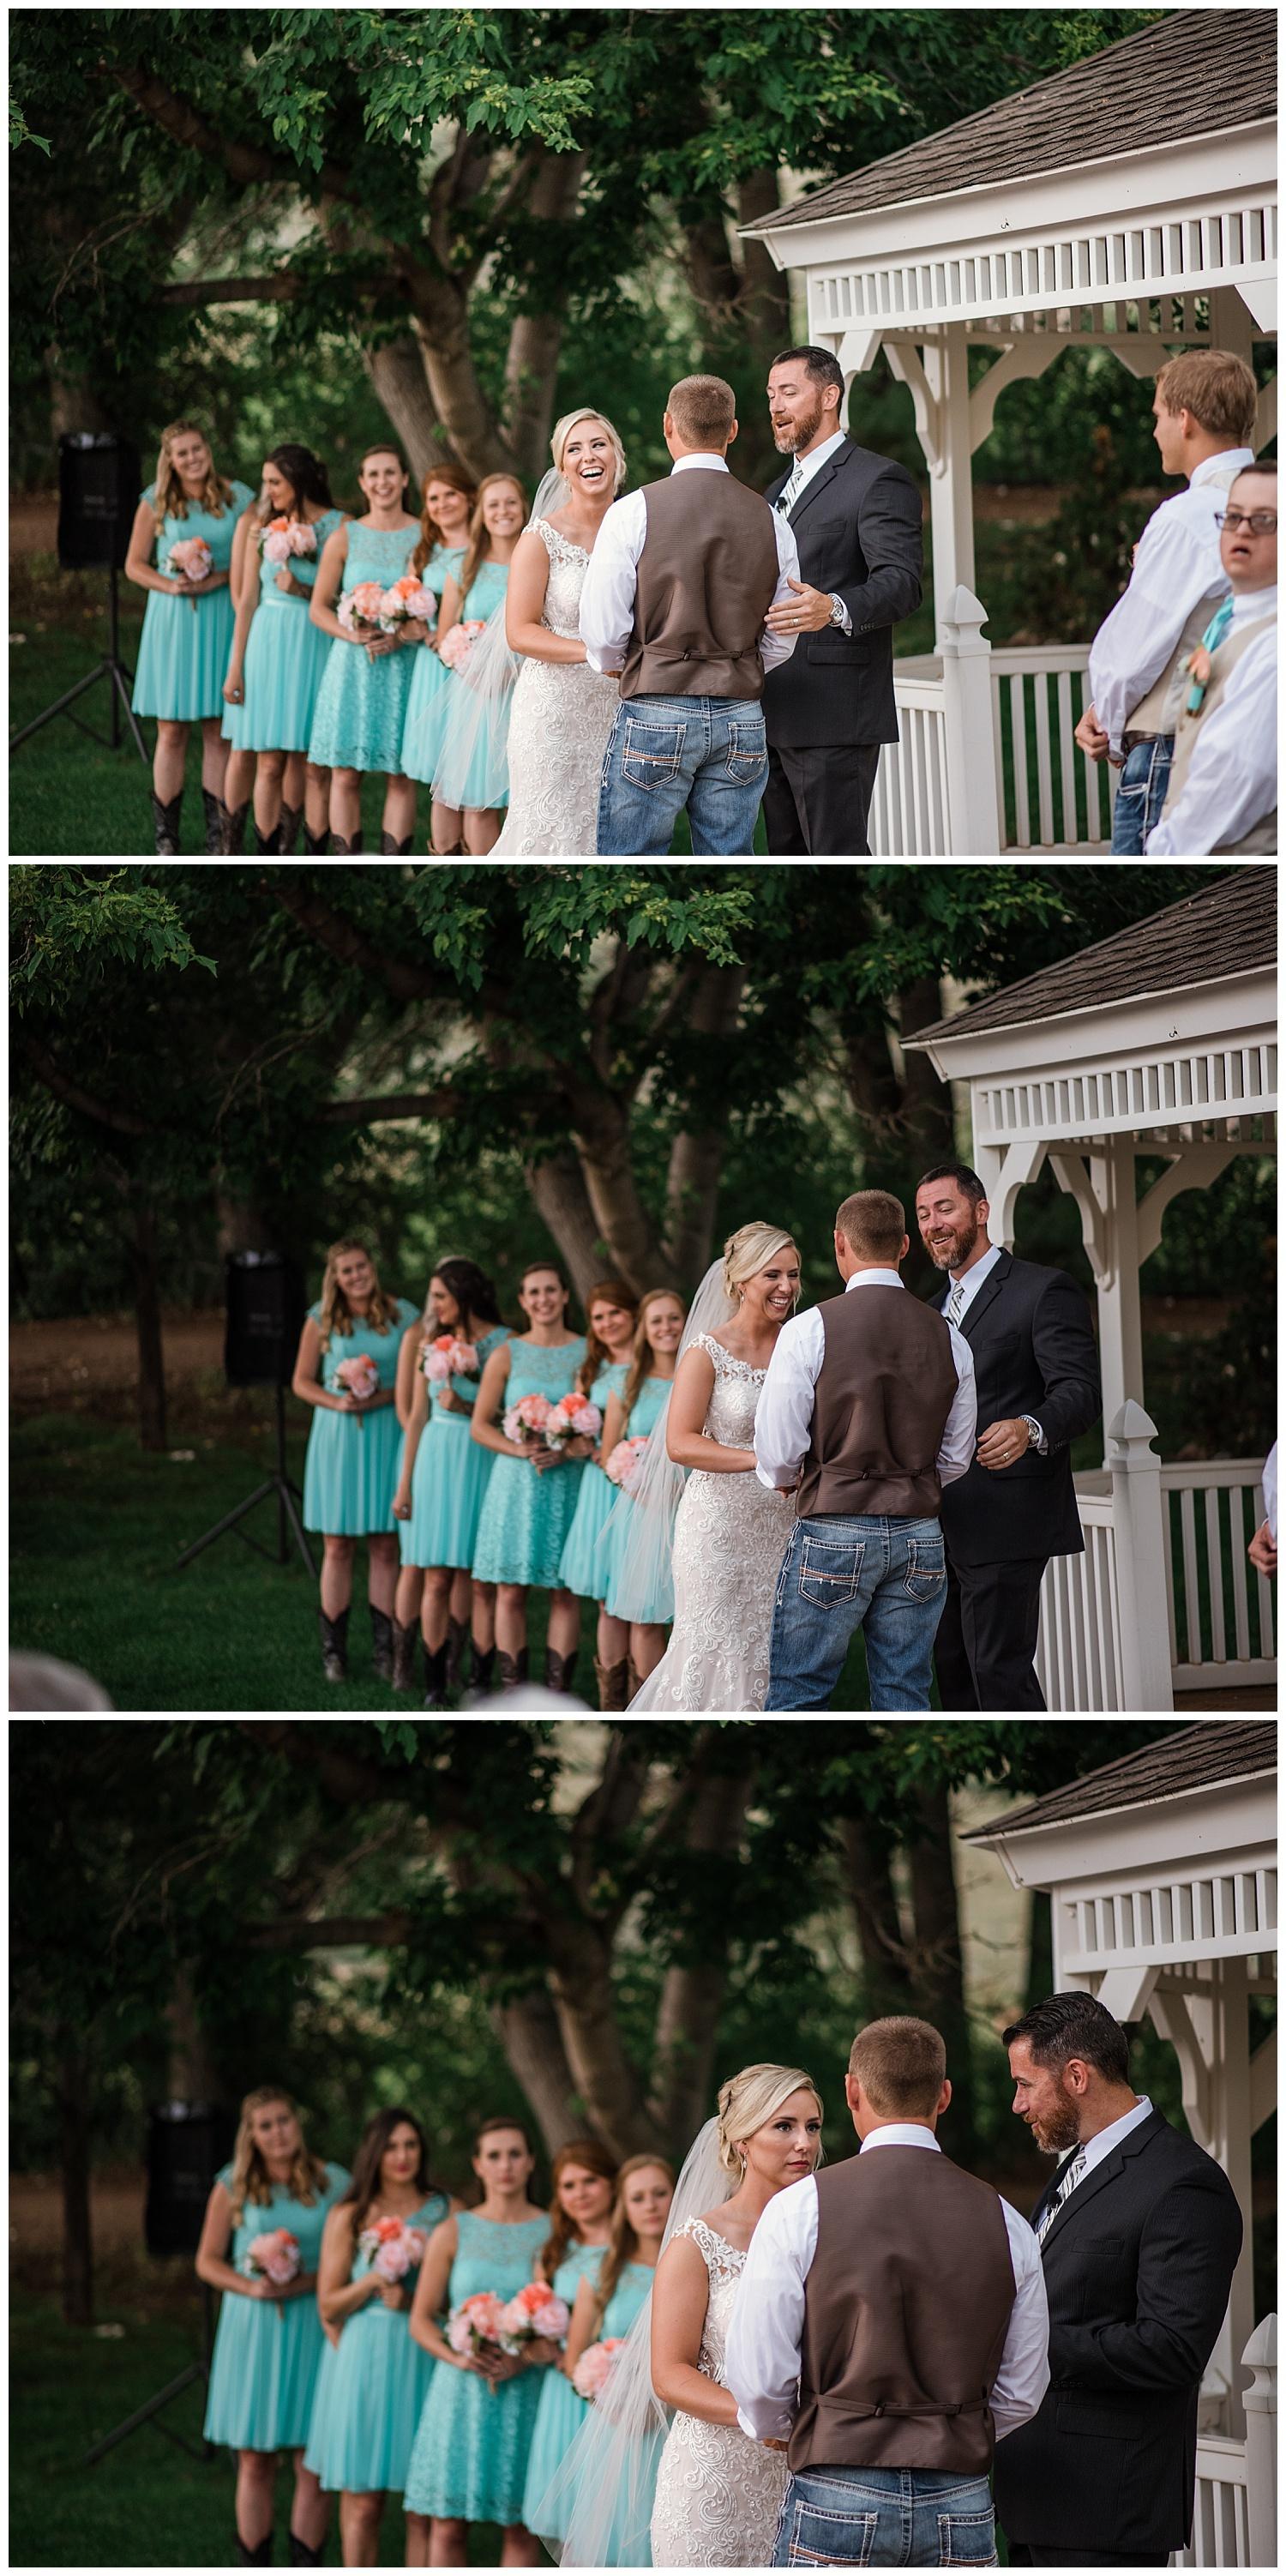 Wedding at Ellis Ranch, Ranch Wedding Colorado, Colorado Wedding Photographer, Denver Wedding Photographer, Denver Colorado Wedding Photographer, Downtown Denver Wedding Photographer, Loveland Wedding Photographer,